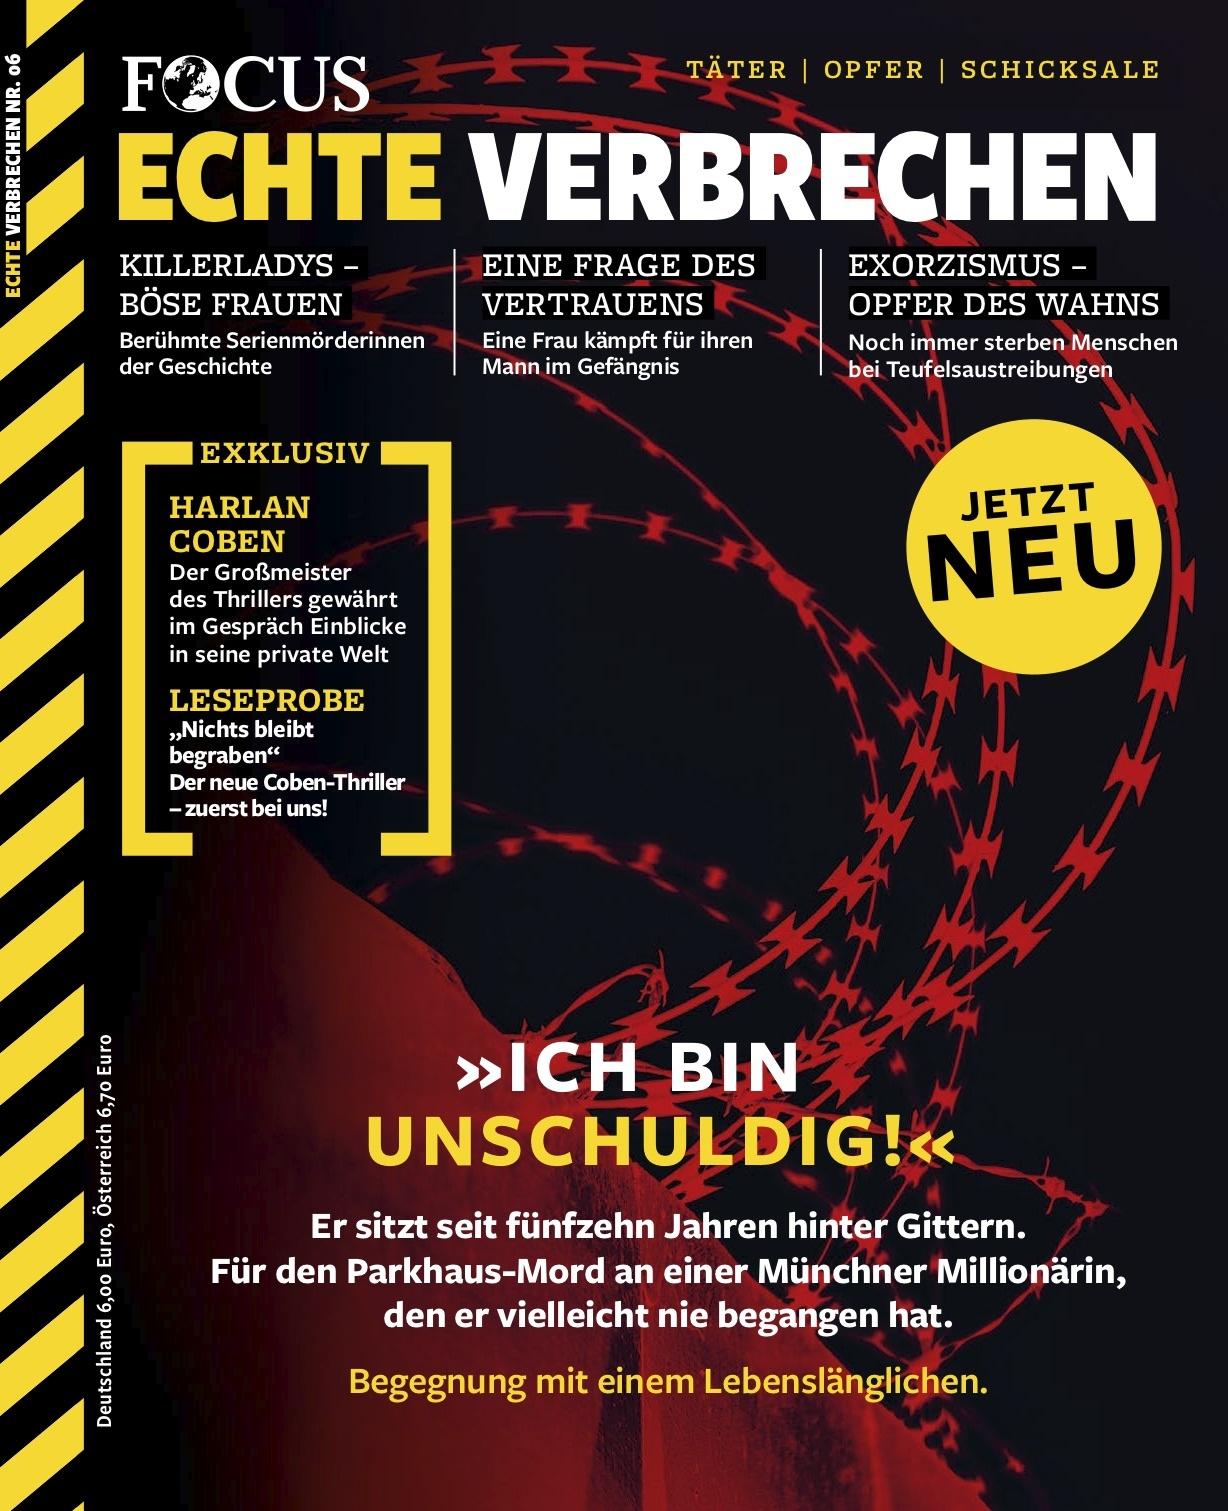 FOCUS Echte Verbrechen FOCUS Echte Verbrechen Nr. 06/2021